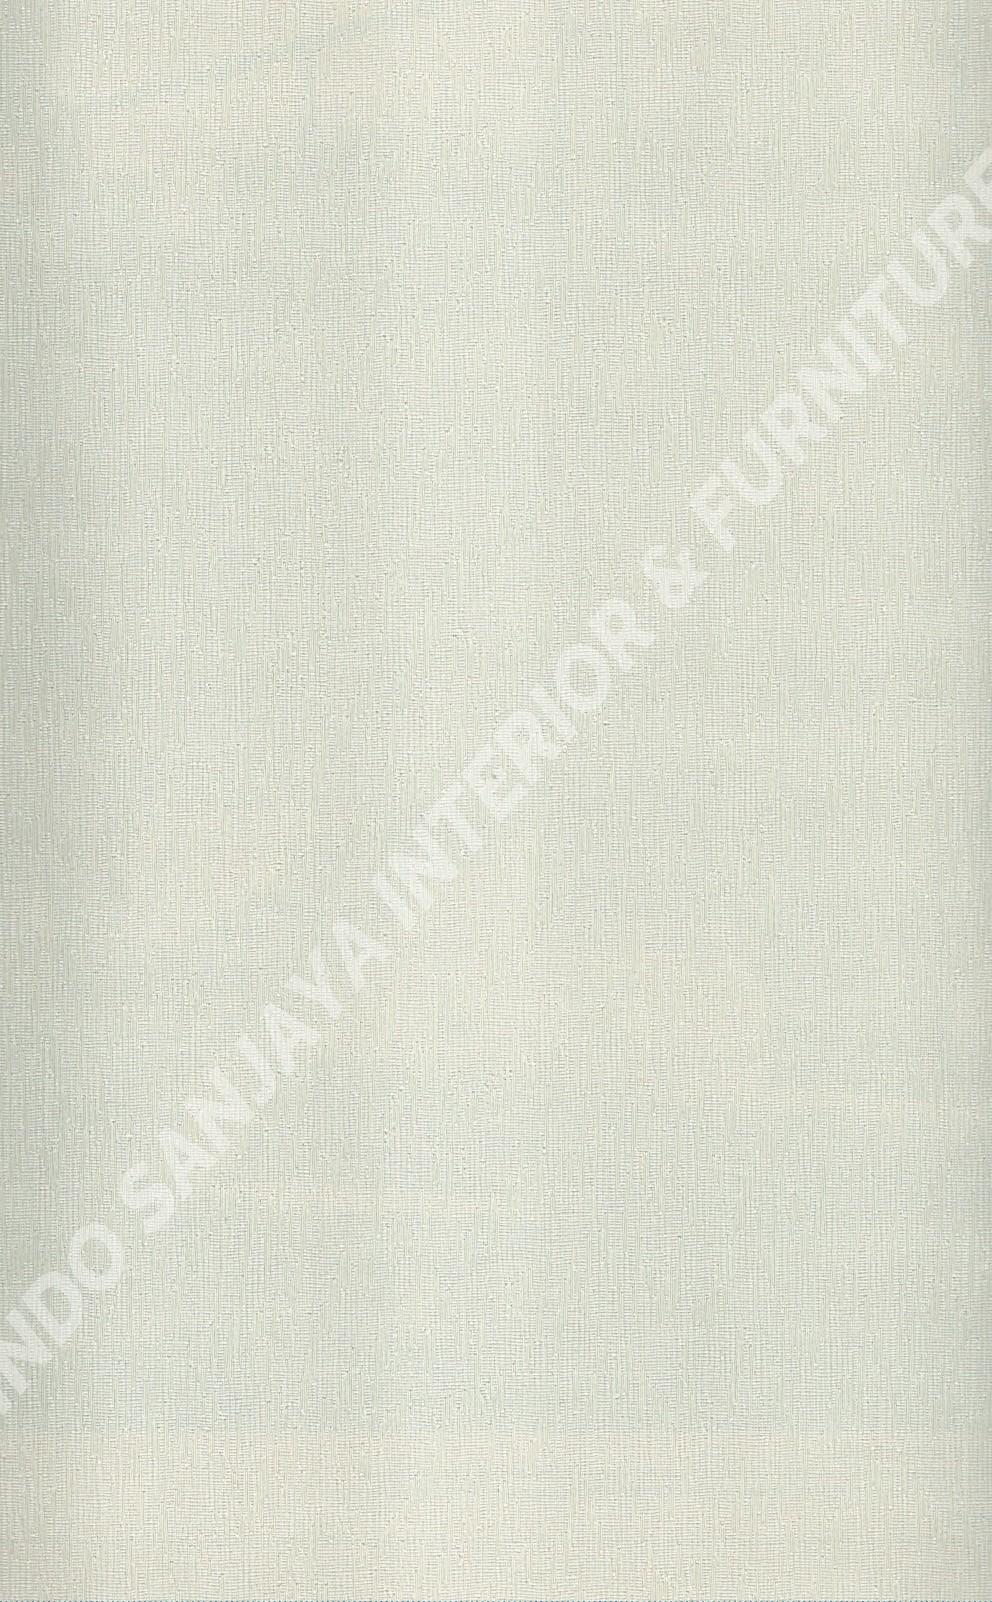 wallpaper   Wallpaper Minimalis Polos 5005-3:5005-3 corak  warna